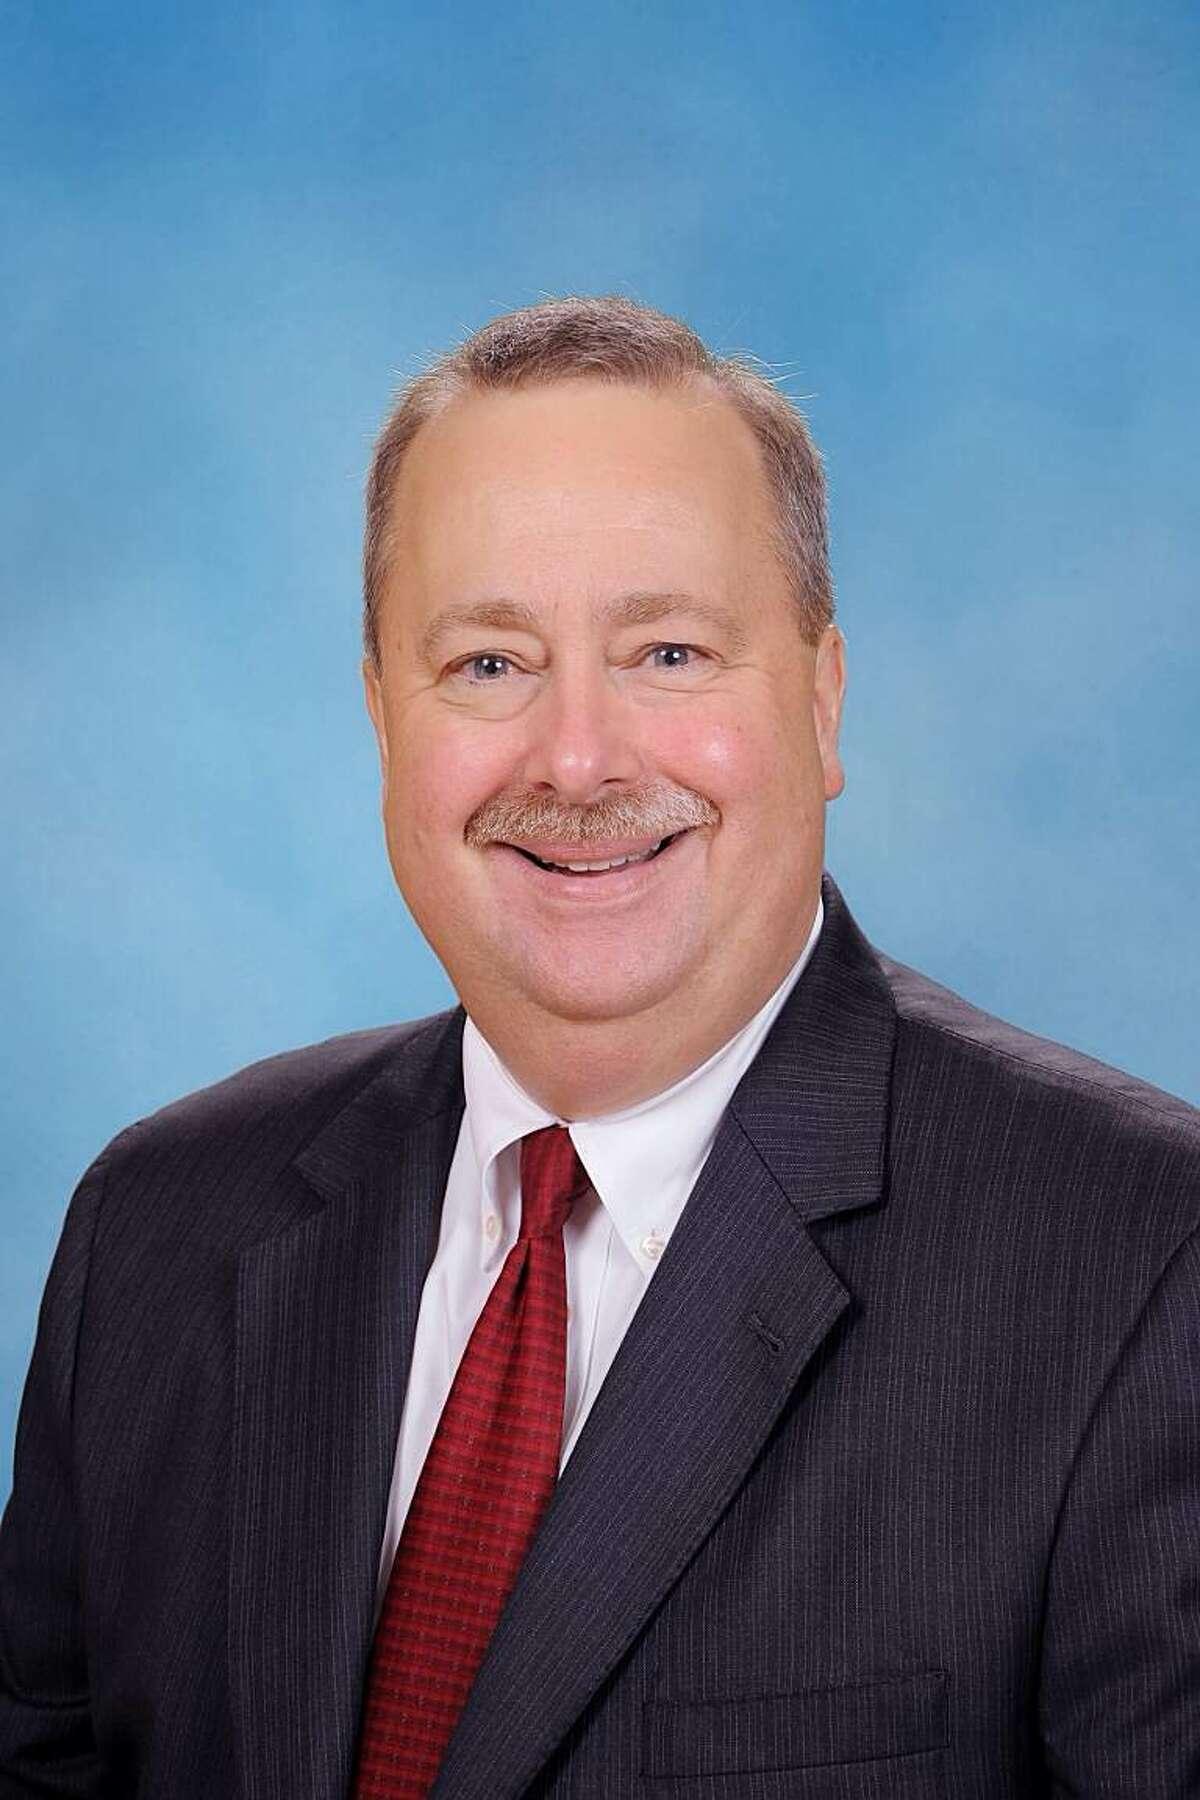 John T. Threet, Principal, West University Elementary School